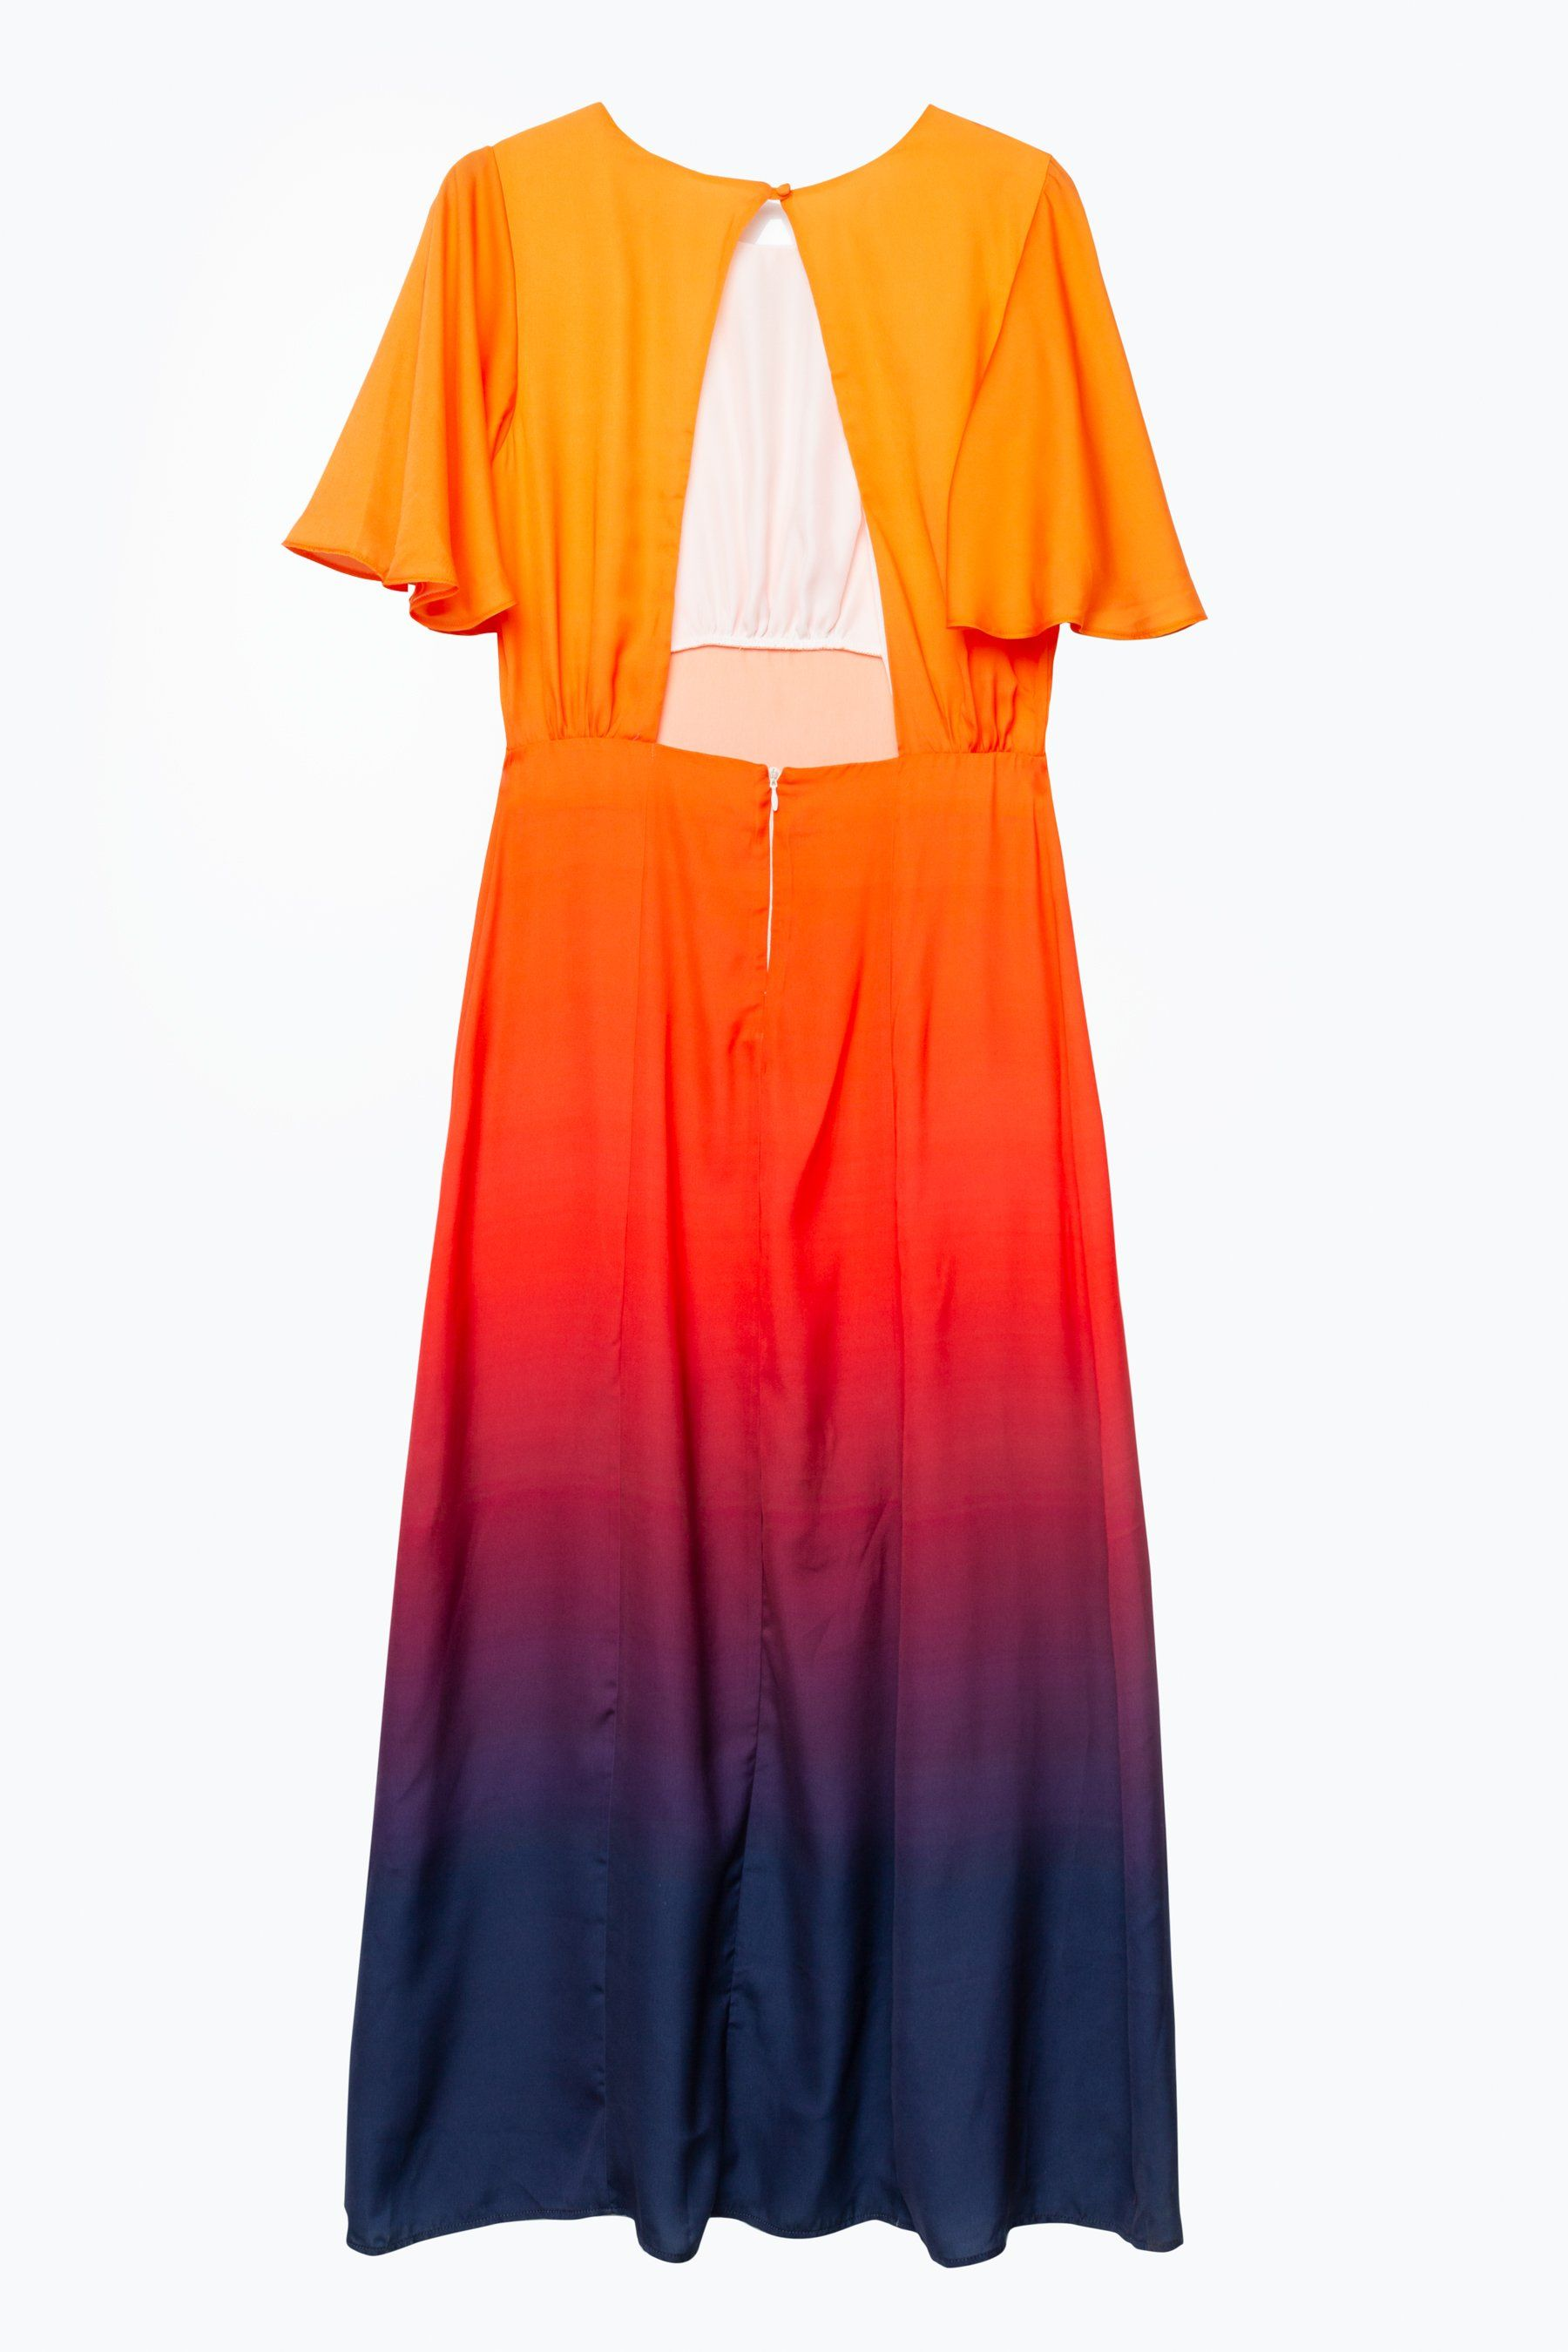 Hype Fading Colours Womens Tea Dress